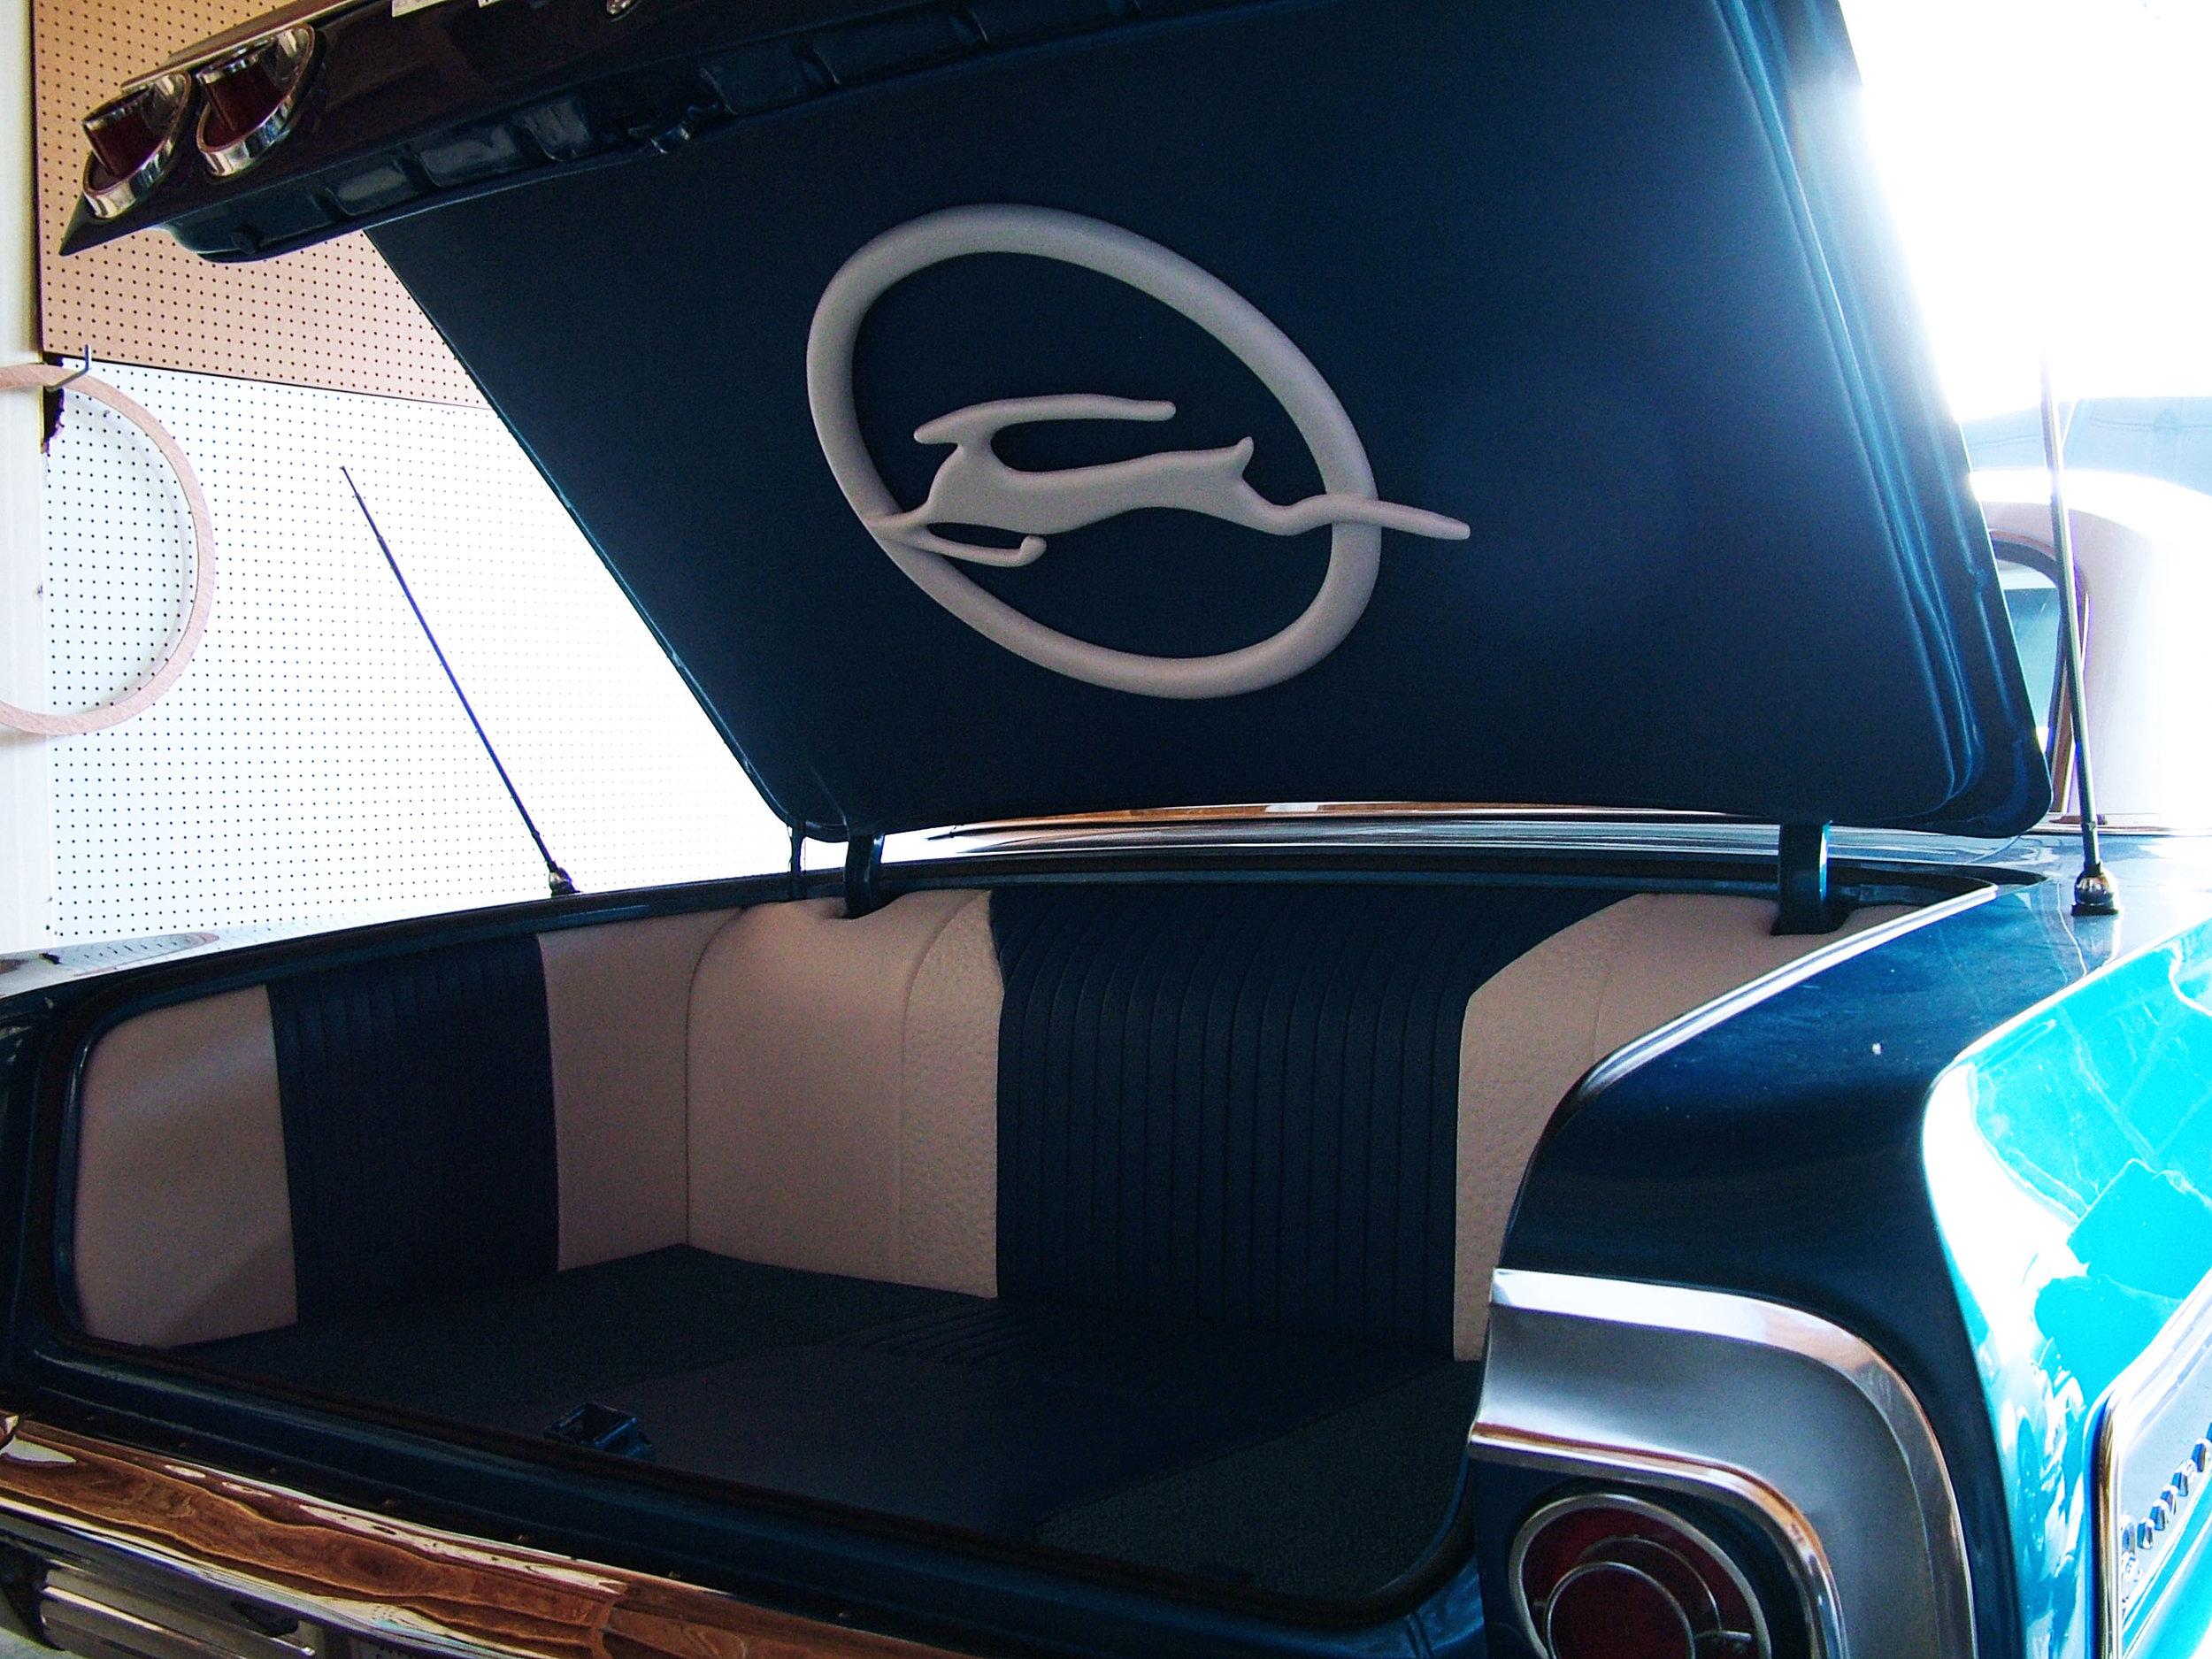 Full custom blue and white leather trunk with custom Impala logo.